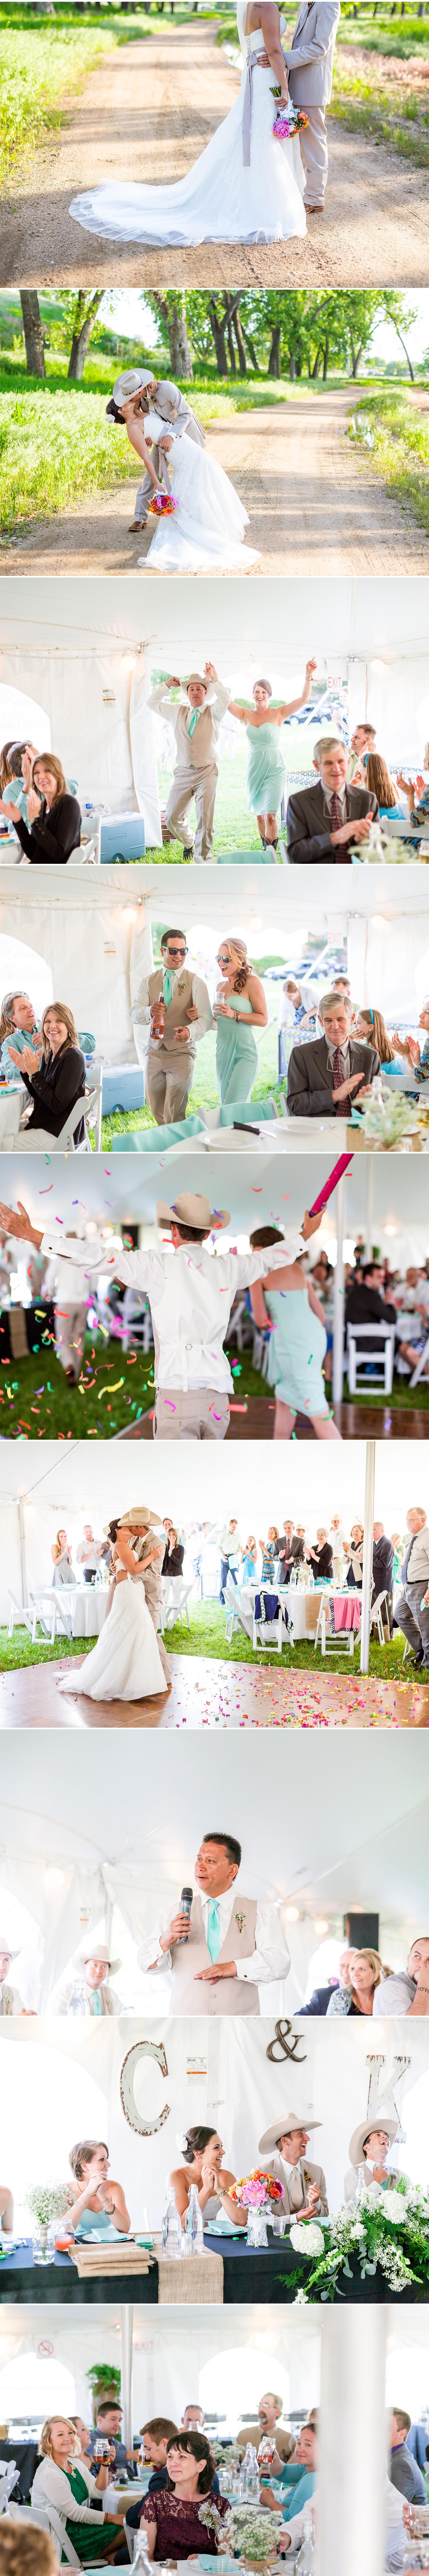 8_loveland wedding reception photos.jpg